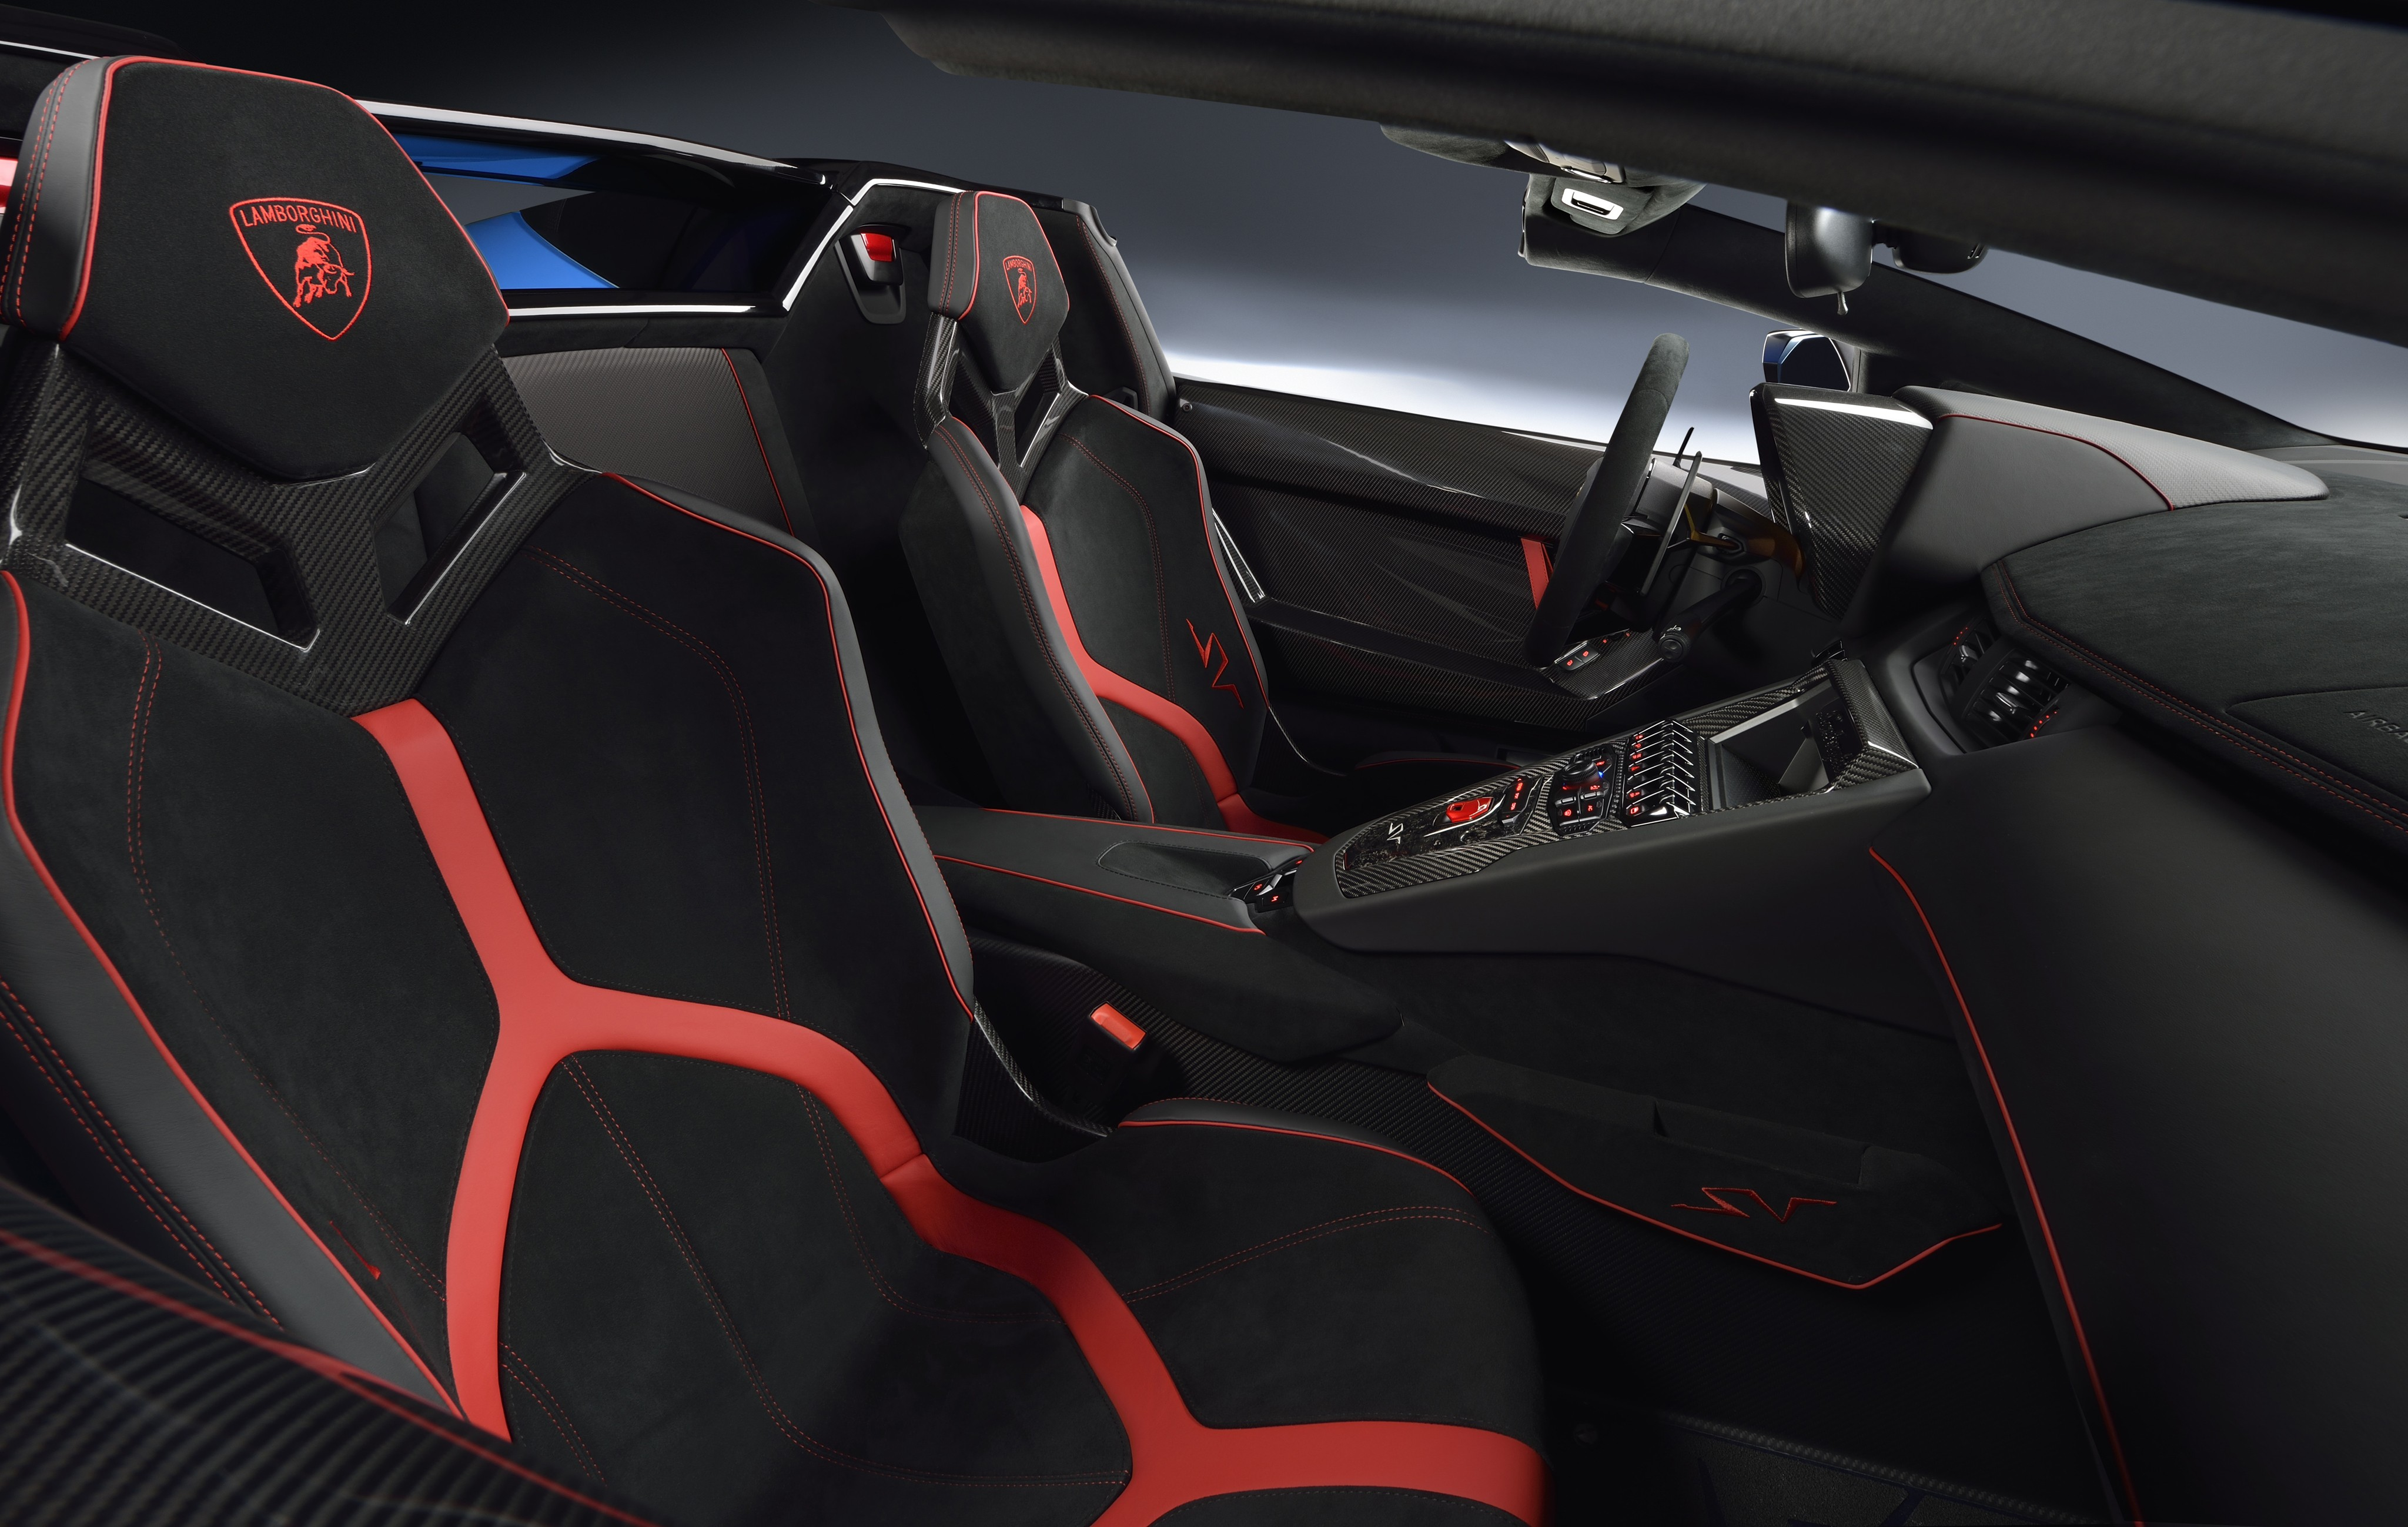 2017 Lamborghini Aventador Lp750 4 Superveloce >> LAMBORGHINI Aventador LP750-4 SV Roadster specs & photos - 2015, 2016, 2017, 2018, 2019 ...